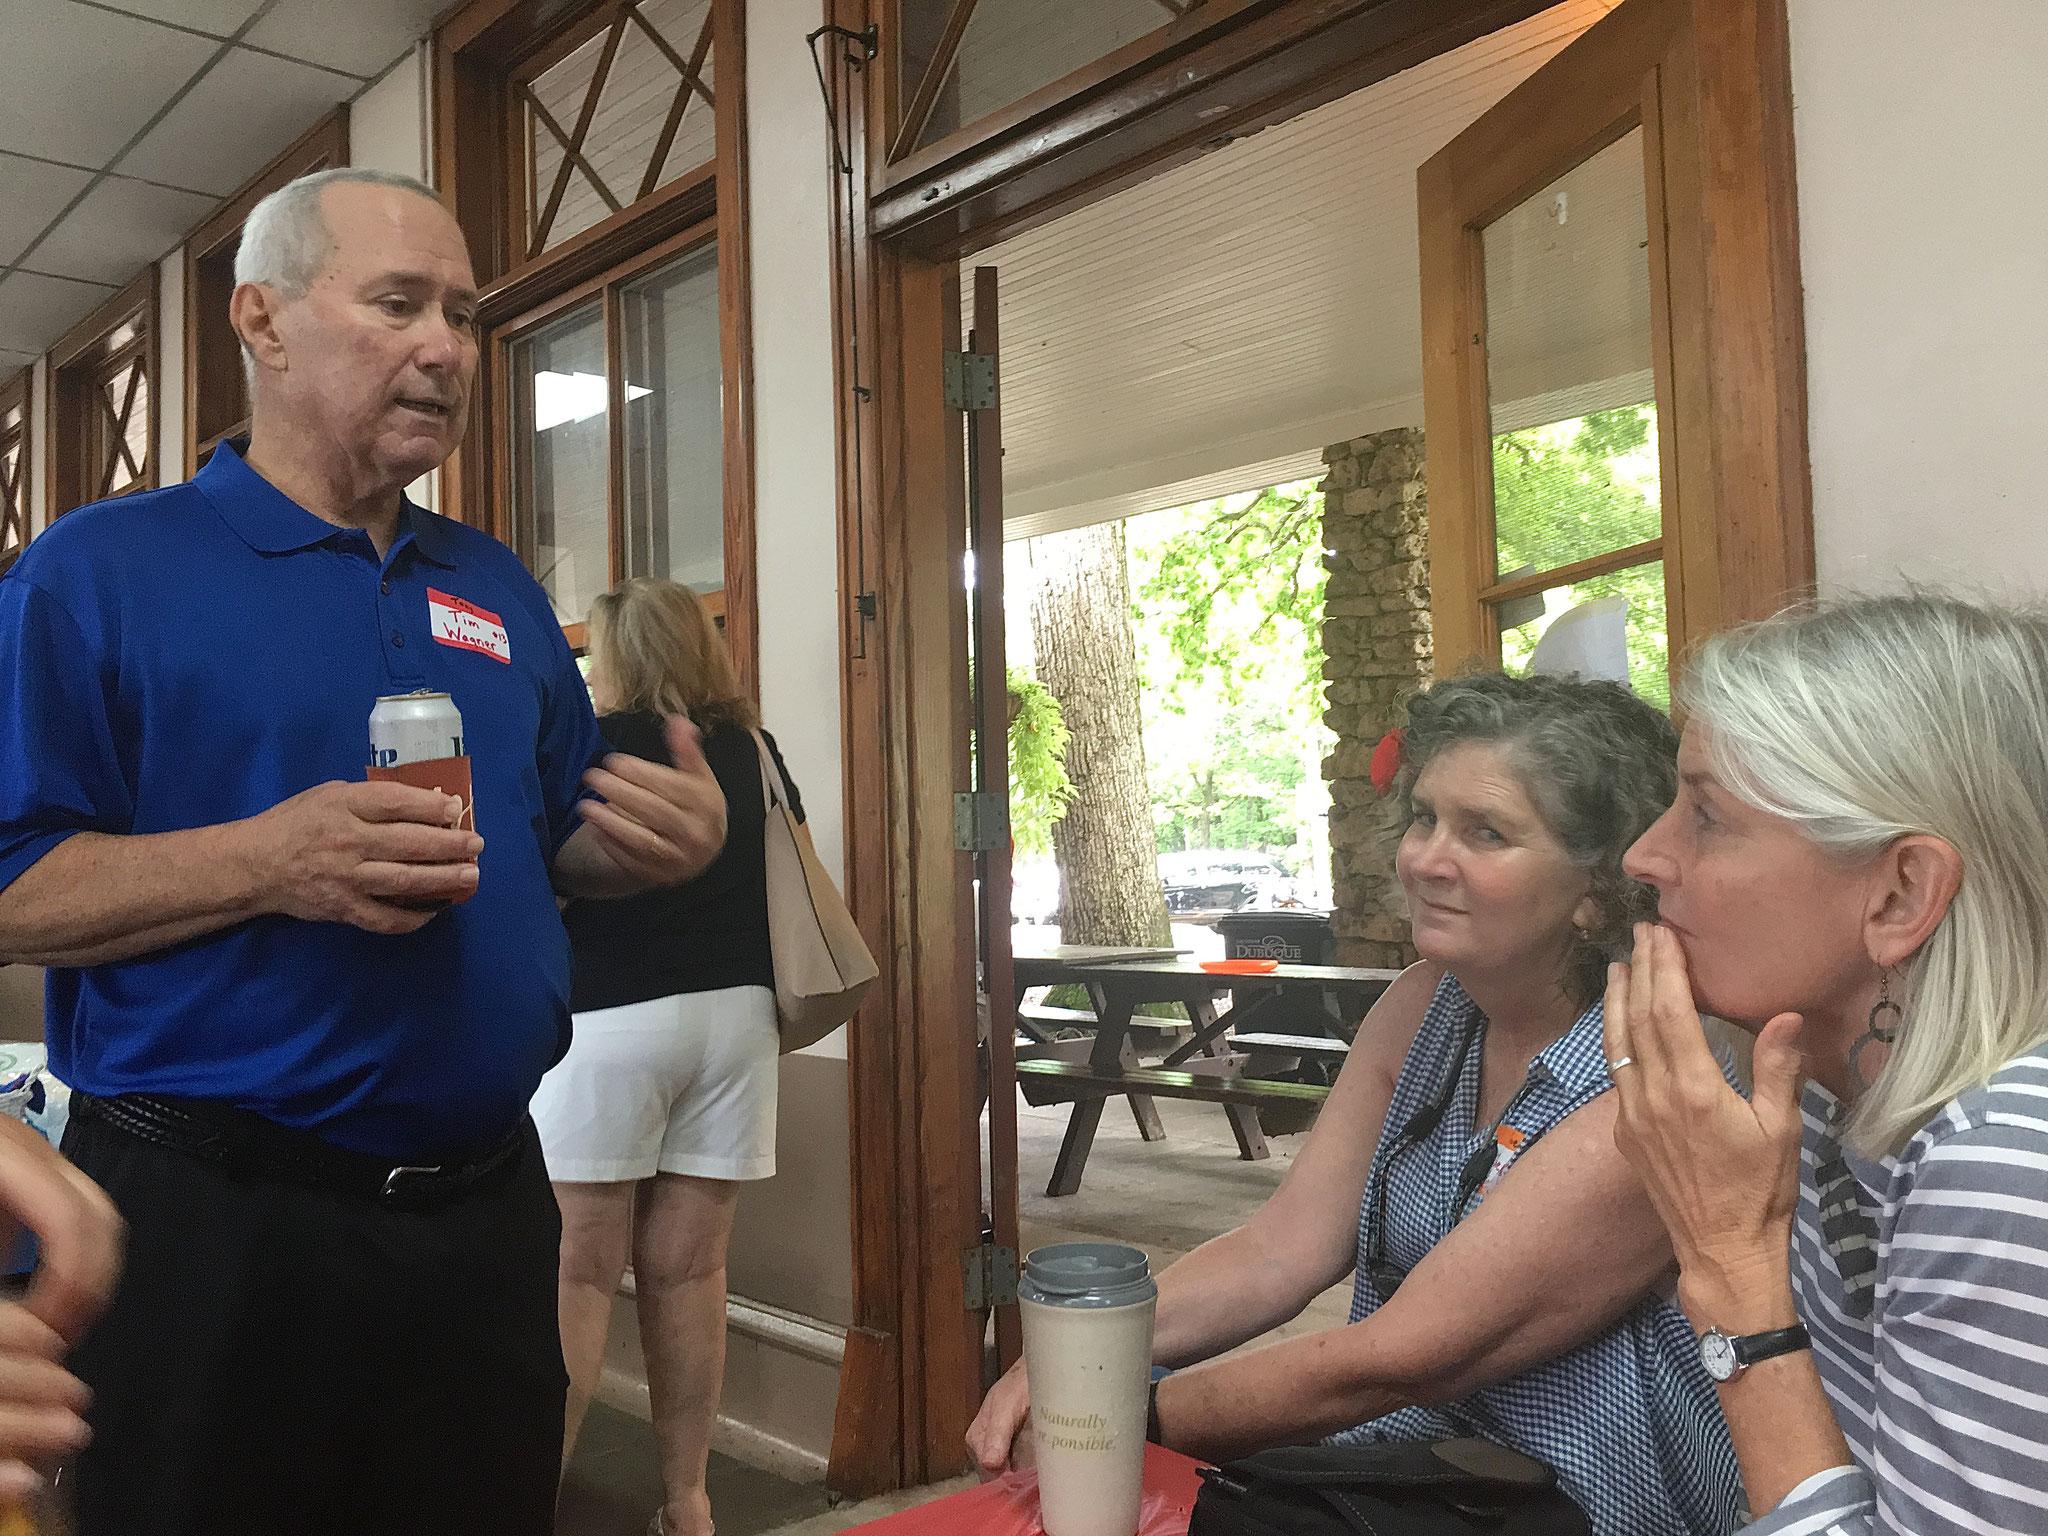 Tim Wagner talks to Jane Elinson and Kathy Schmidt